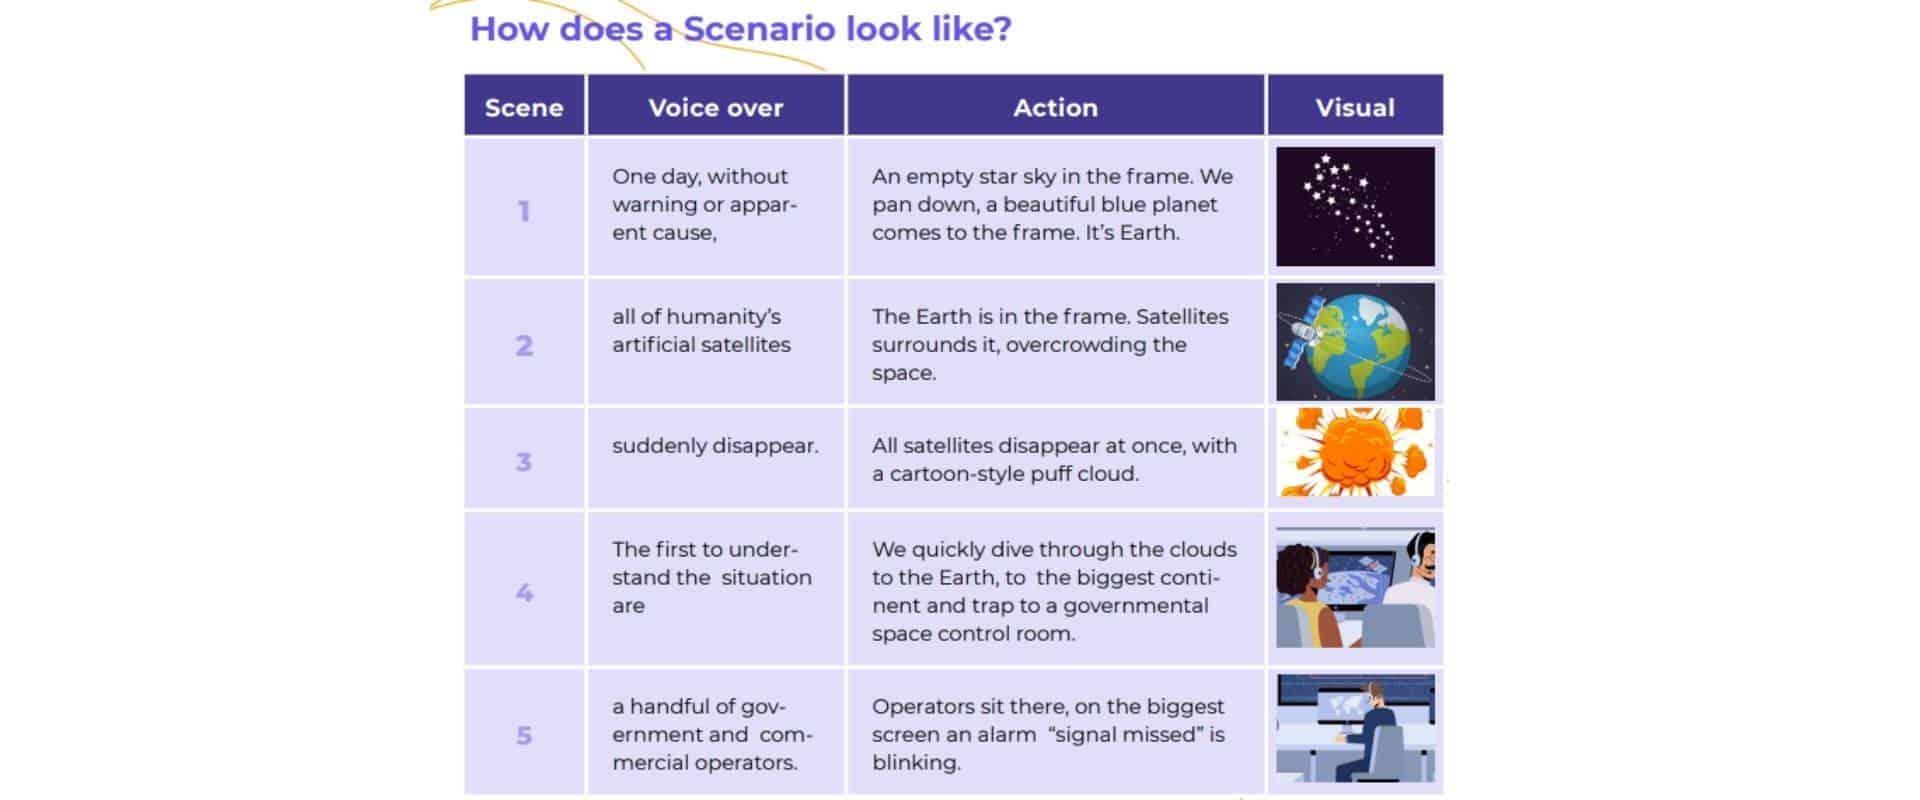 How does scenario look like?